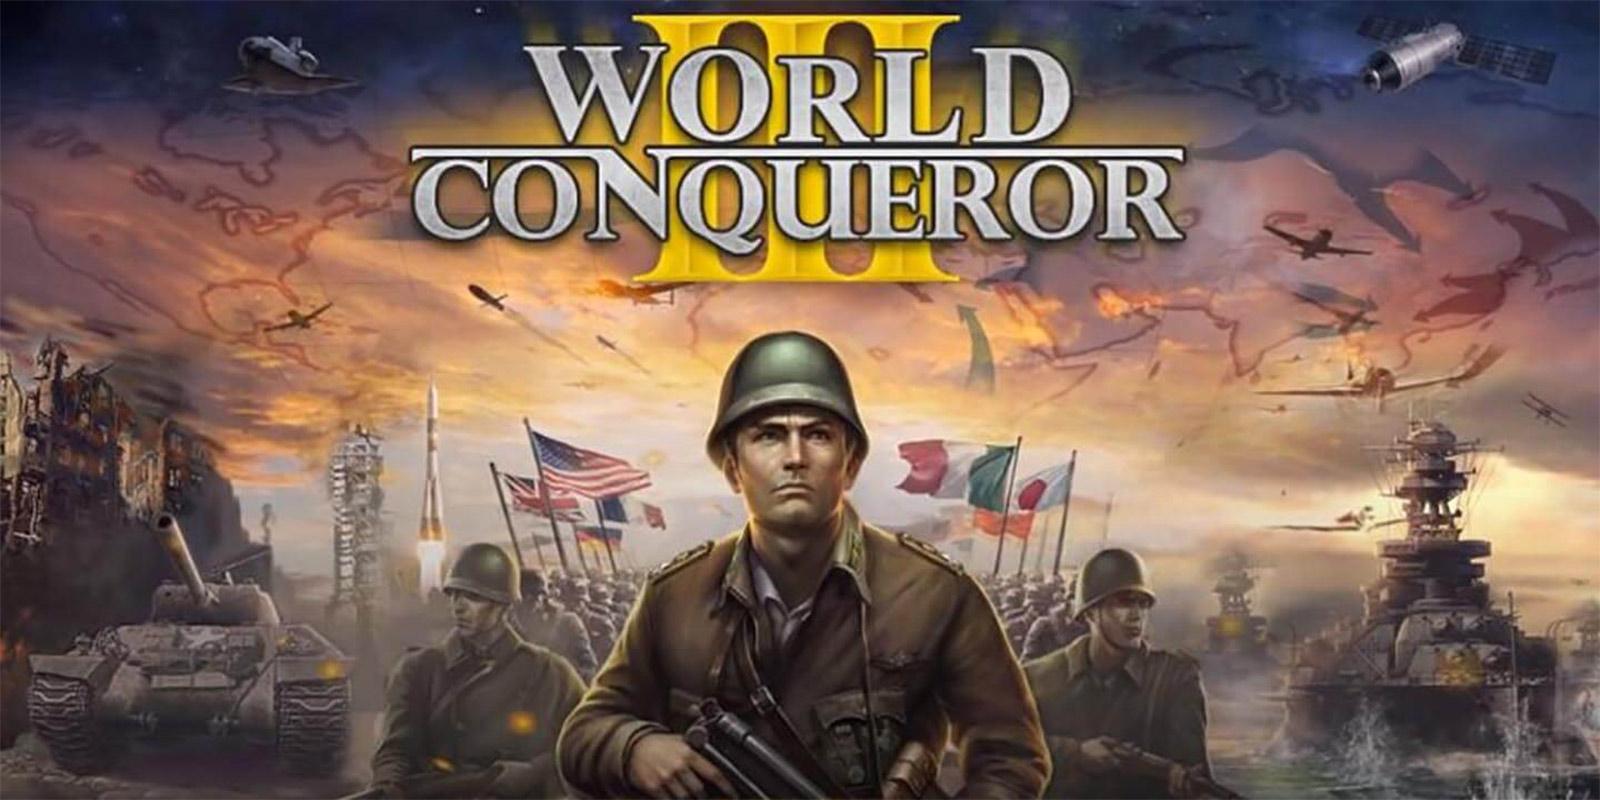 World Conqueror 3 Mod Apk 1.2.42 (Unlimited Medals)